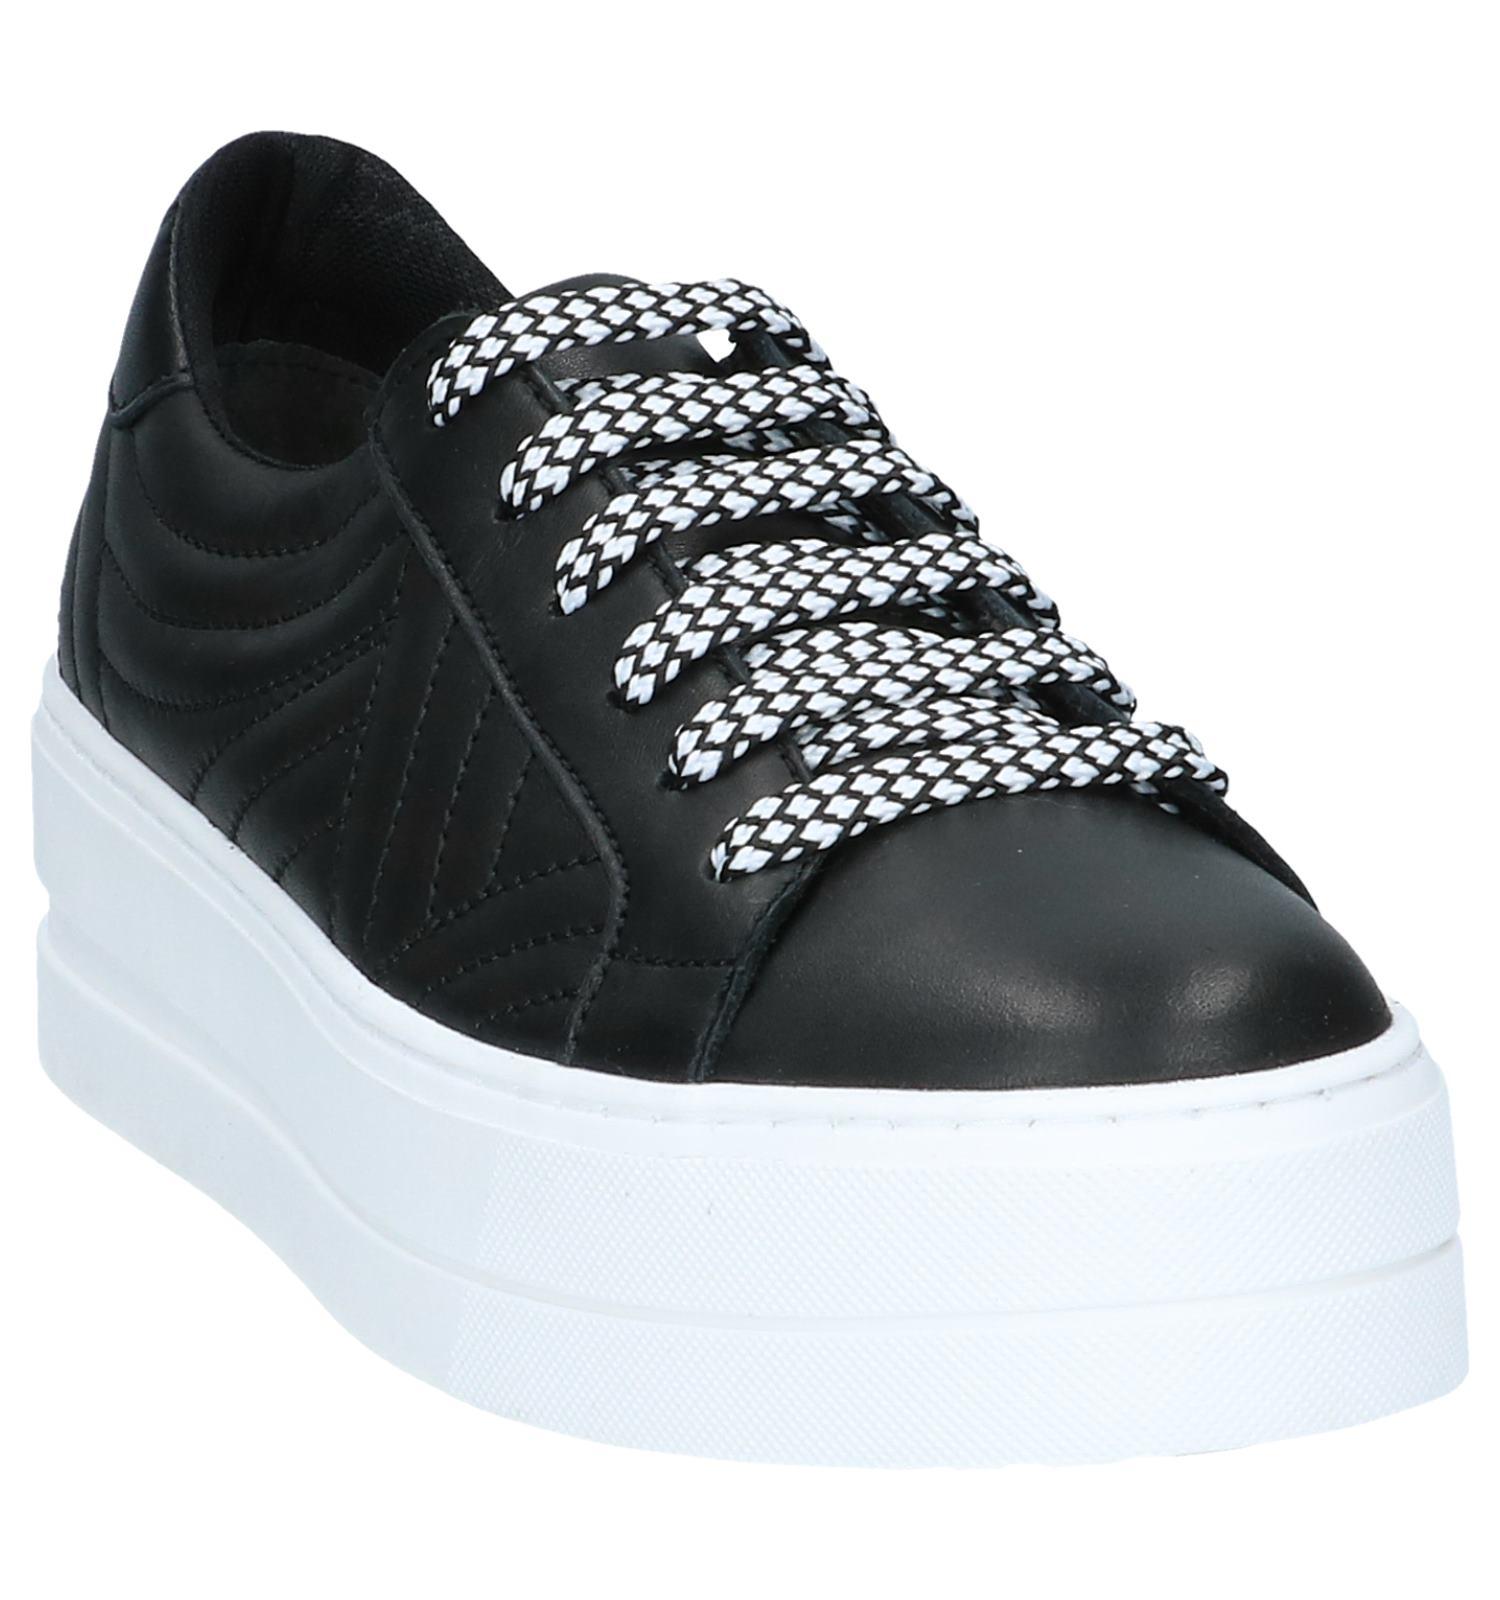 Tamaris Lage Sneakers Zwarte Lage Zwarte Sneakers Tamaris Zwarte thQsrd